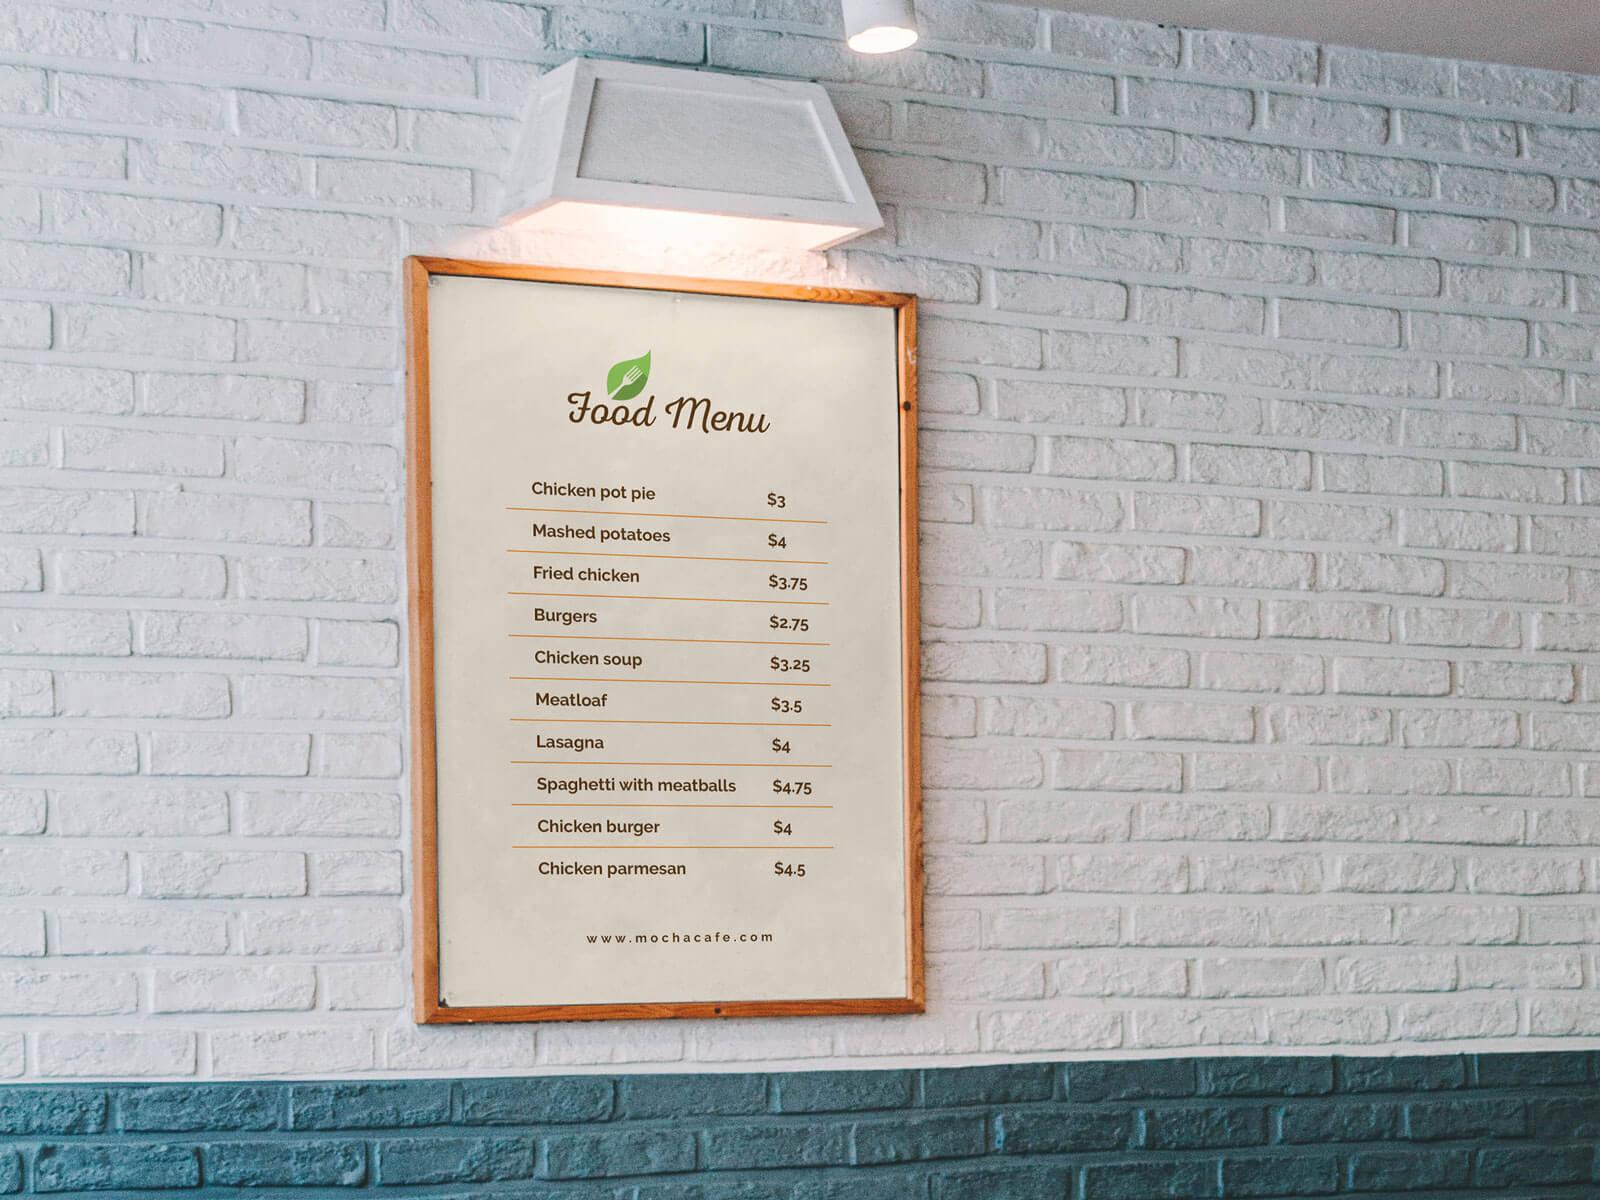 Free-Wall-Framed-Food-Restaurant-Menu-Poster-Mockup-PSD-2